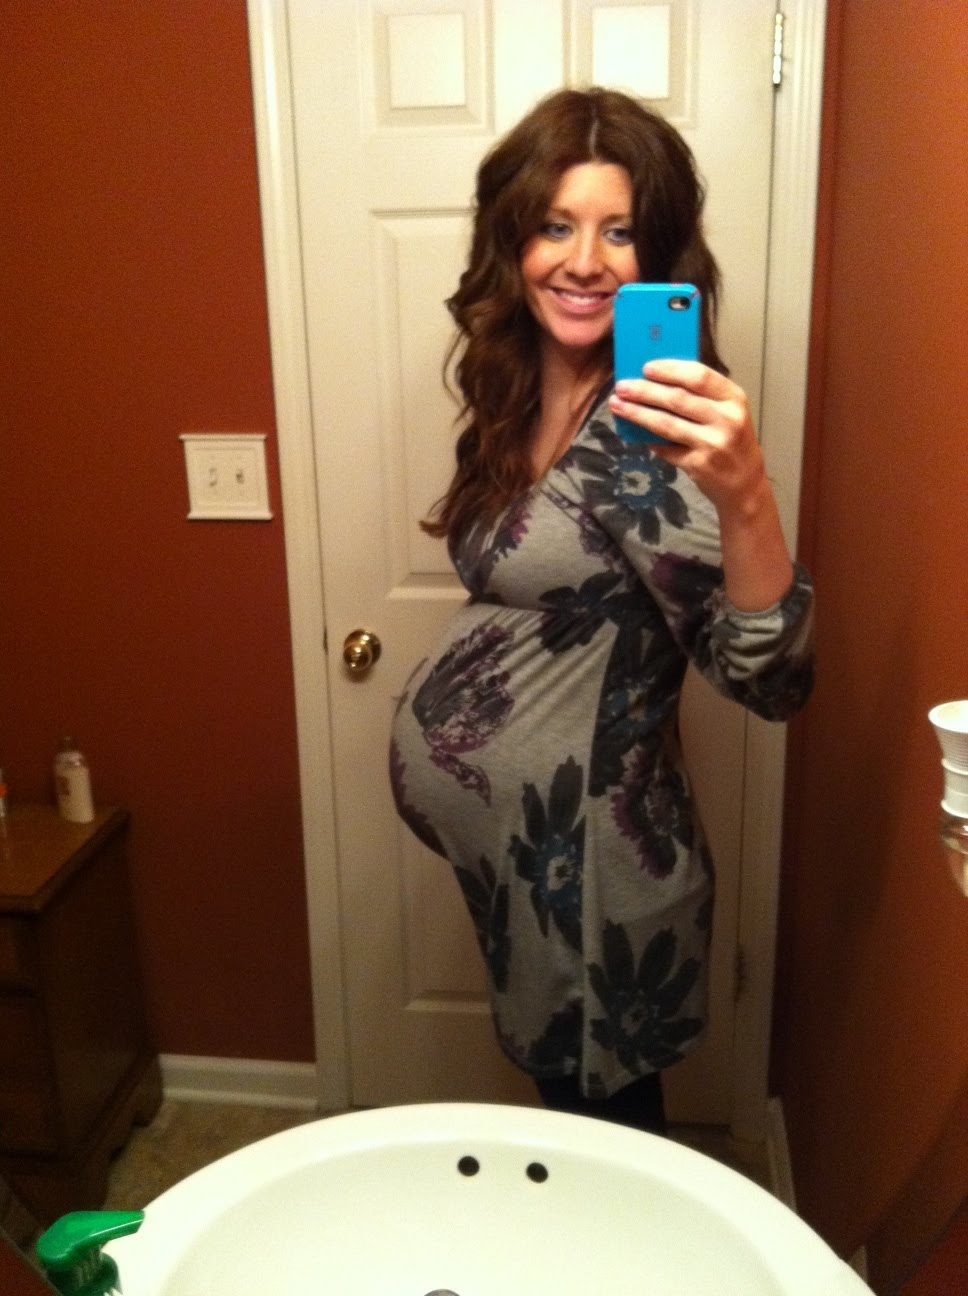 21 Weeks Pregnant Girl